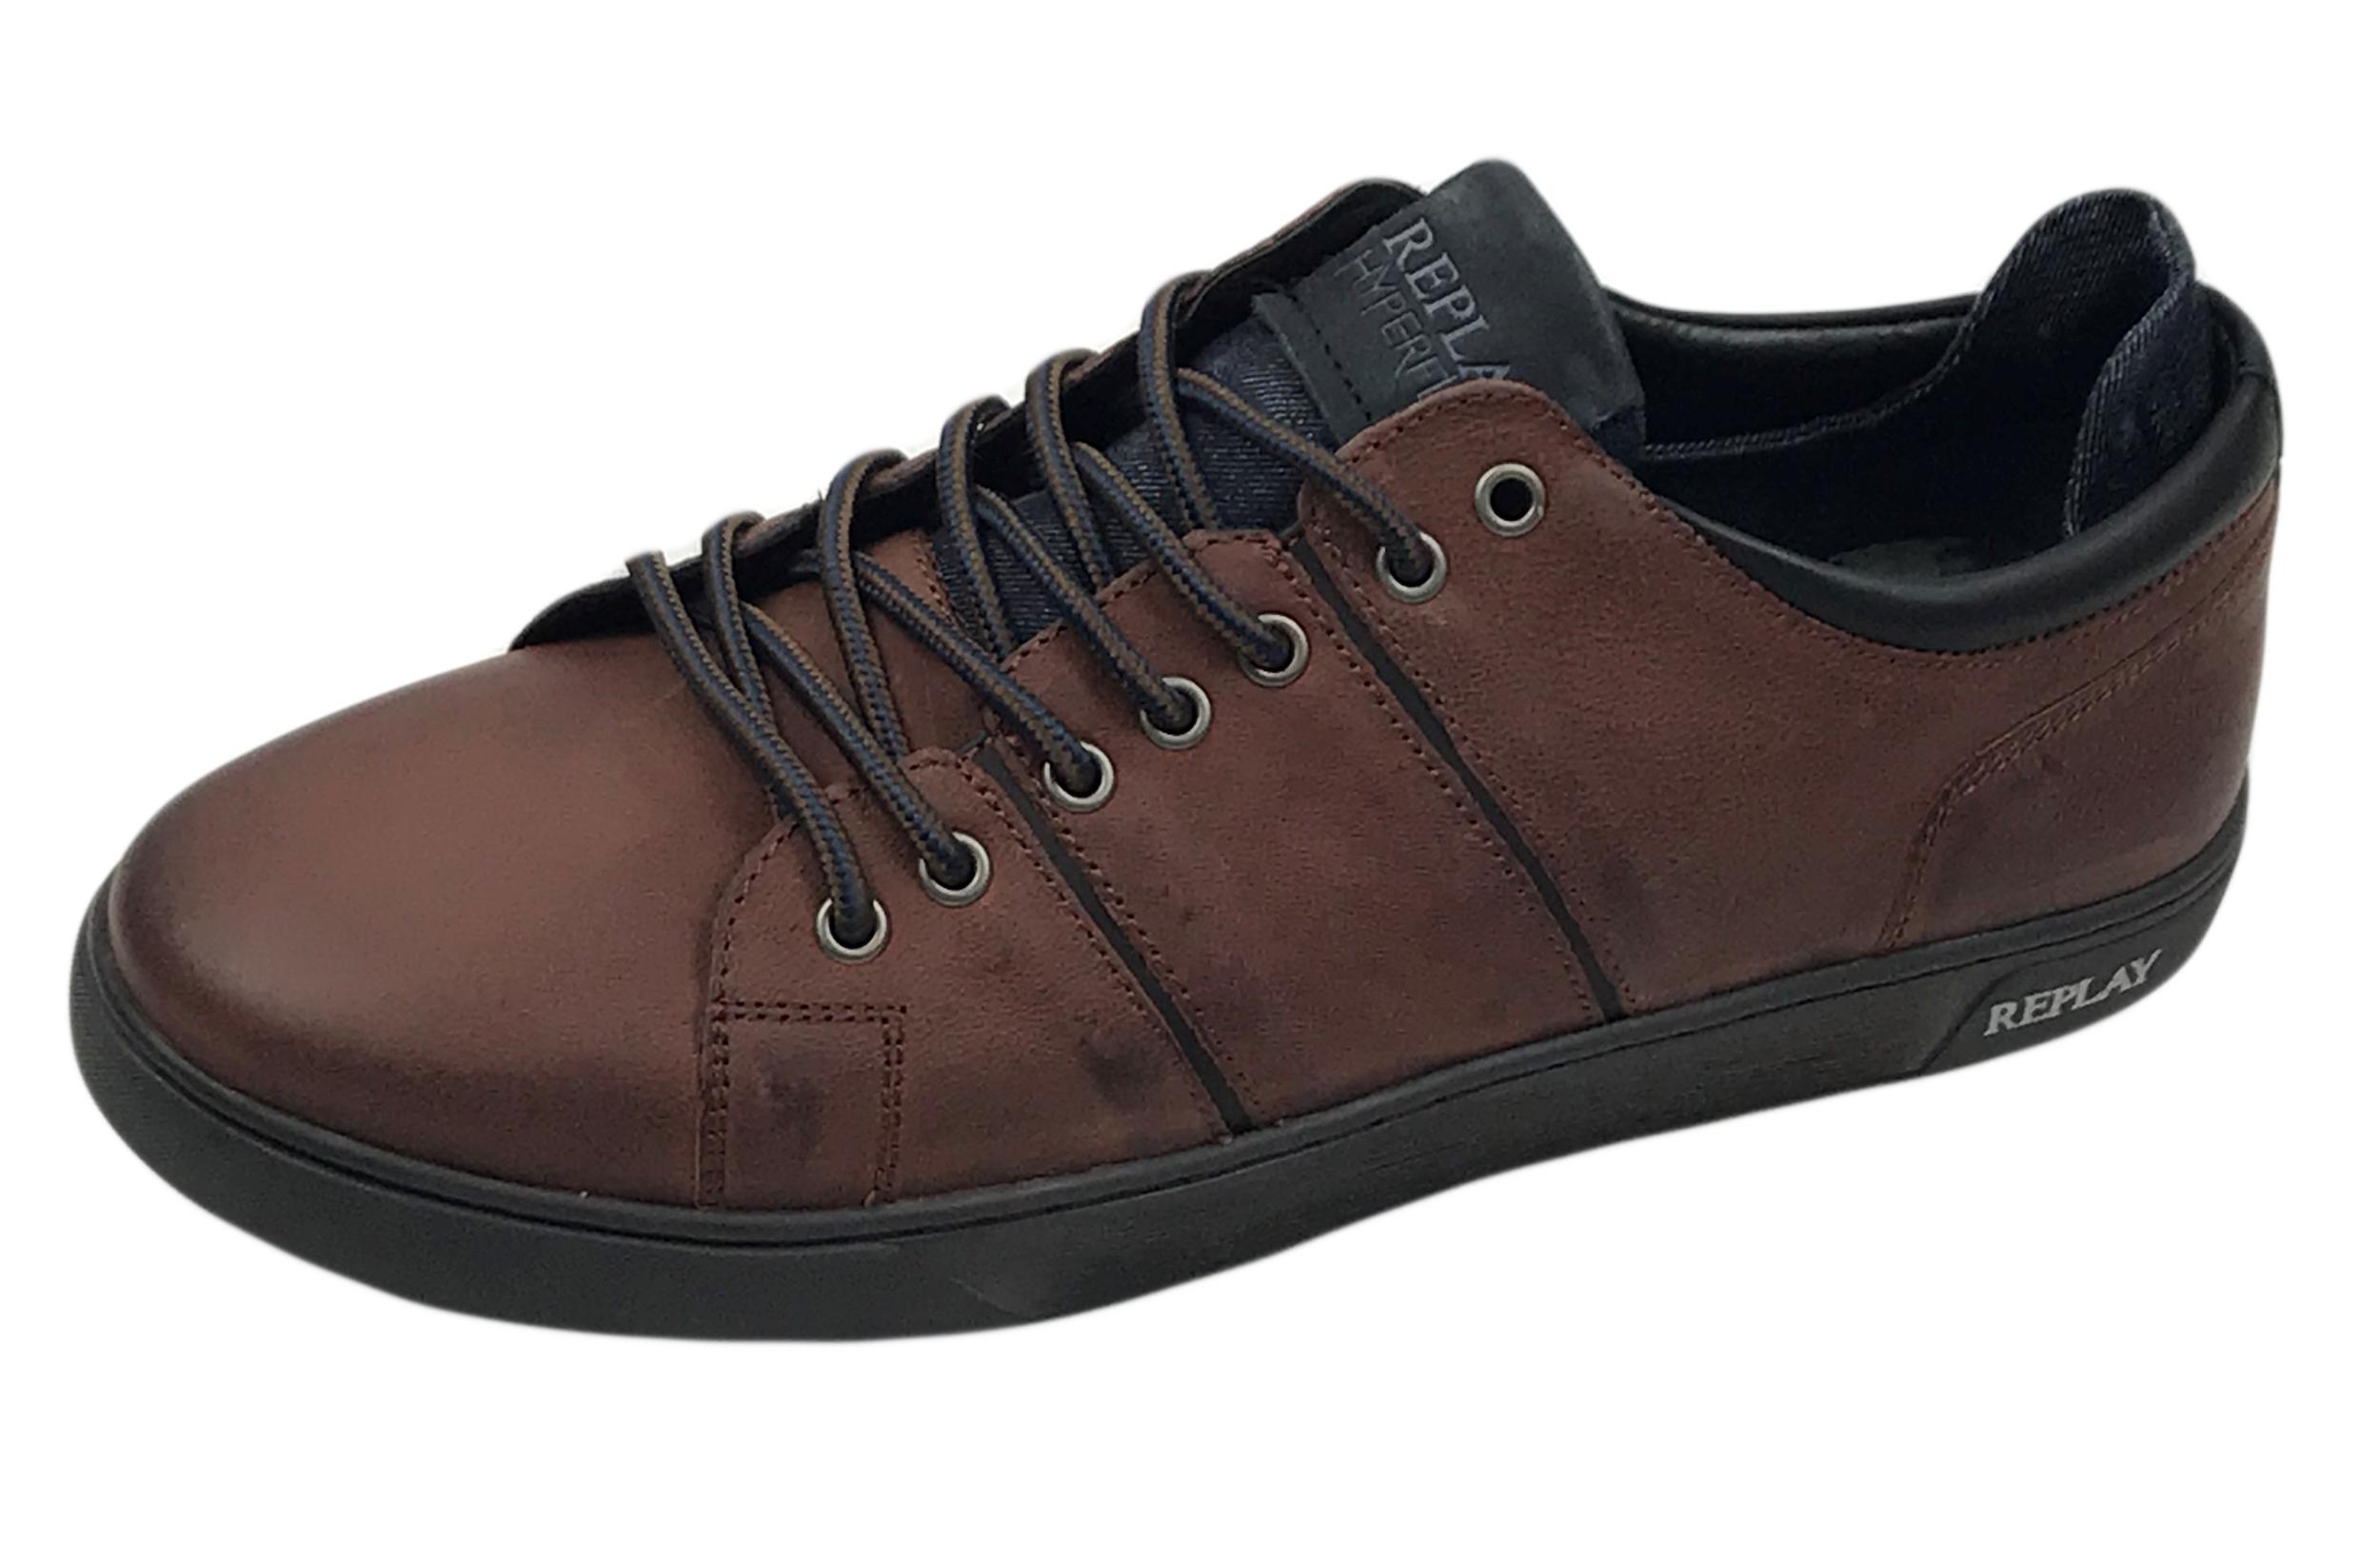 40-44 NEU Herren Halbschuhe Schnürschuhe Wildleder-Optik Schuhe Sneaker Gr